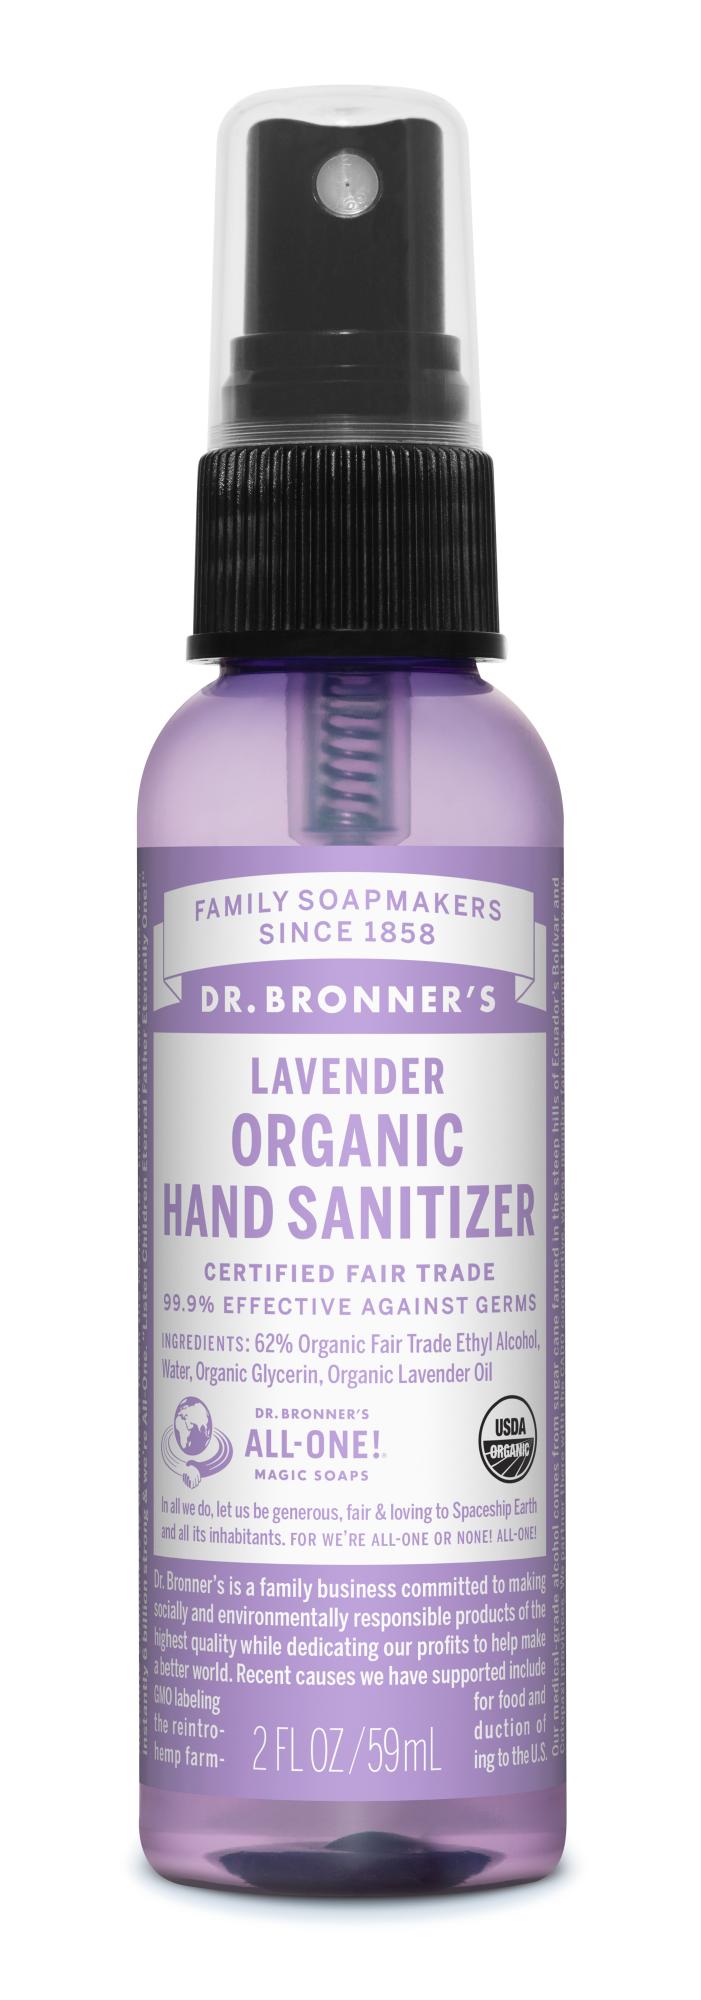 Ekologiškas dezinfekatorius DR. BRONNER'S Levander, 59 ml